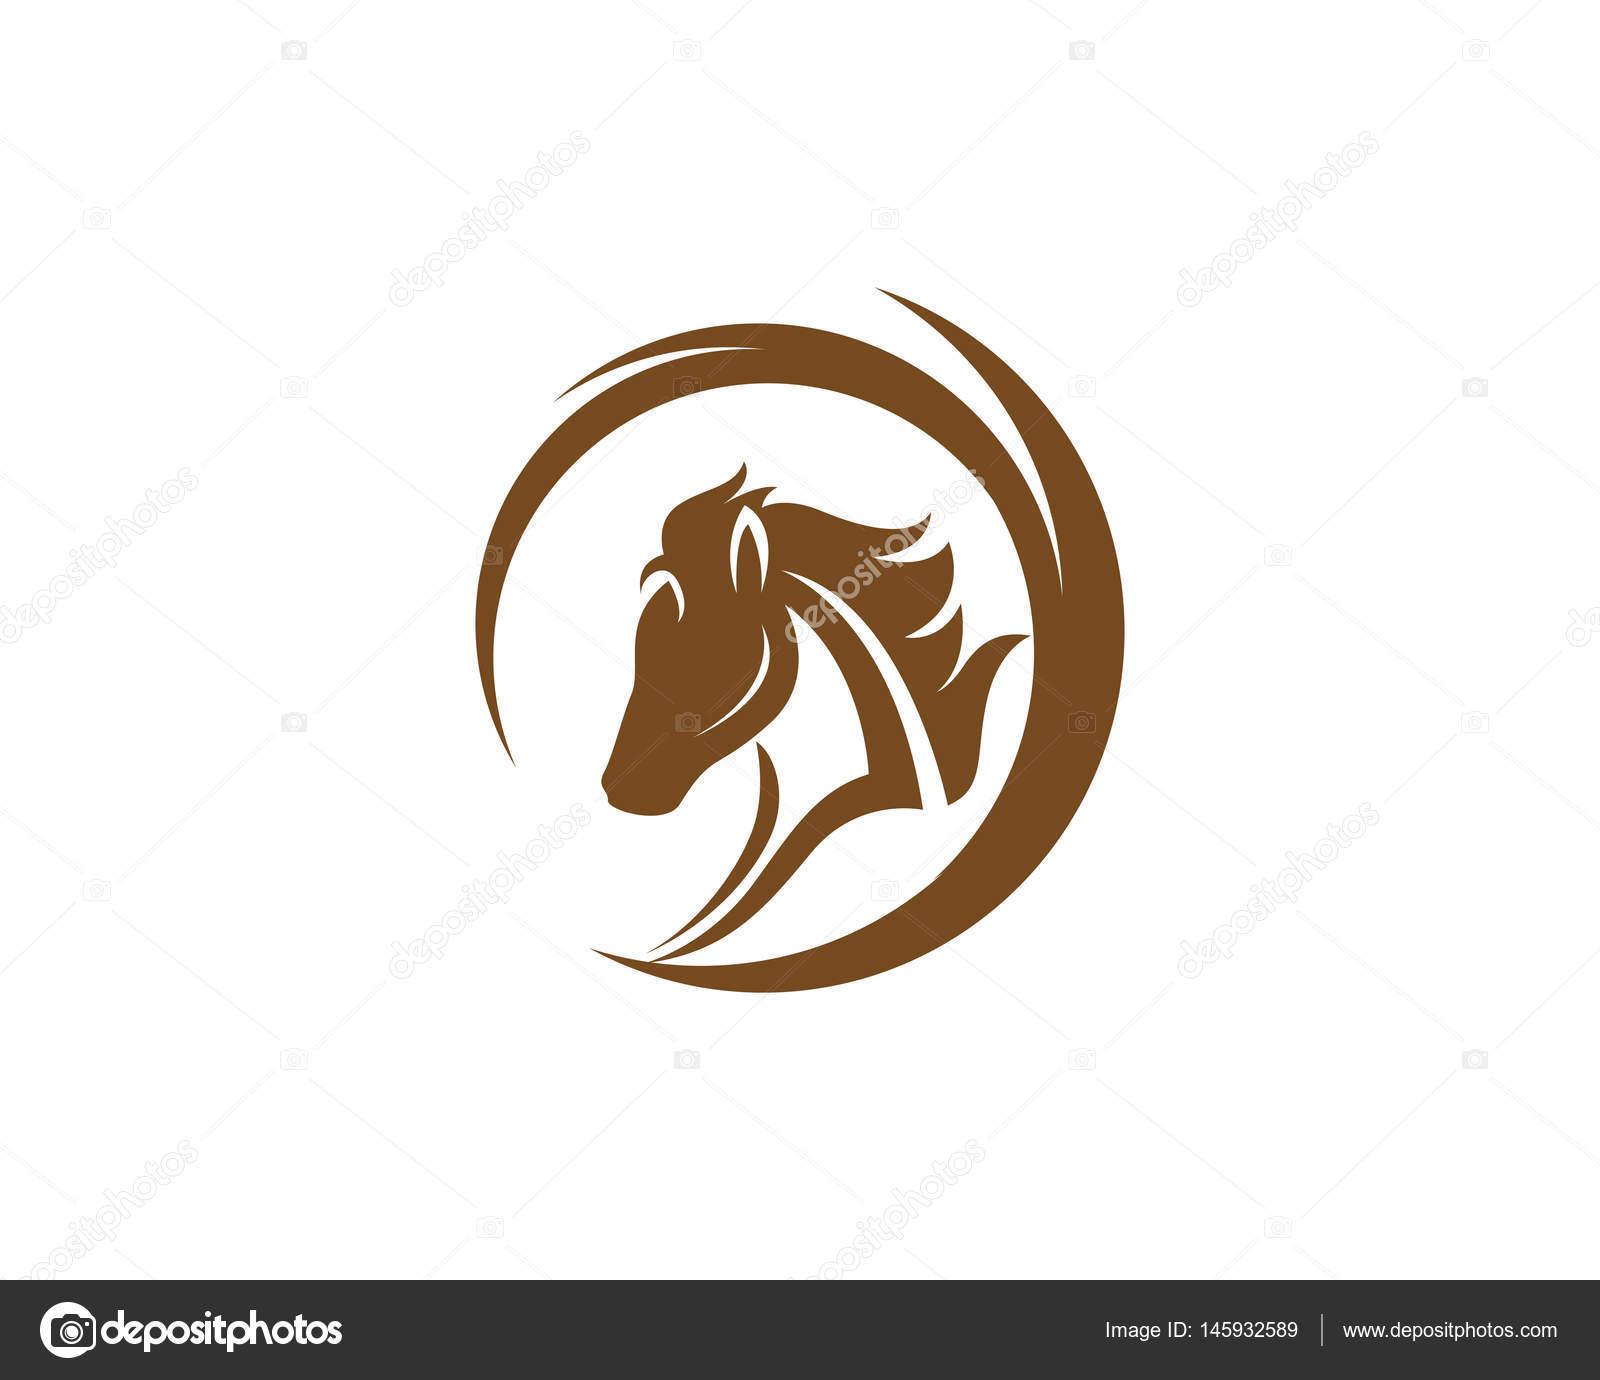 Kopf Pferd Logo und Vorlage Symbole — Stockvektor © elaelo #145932589